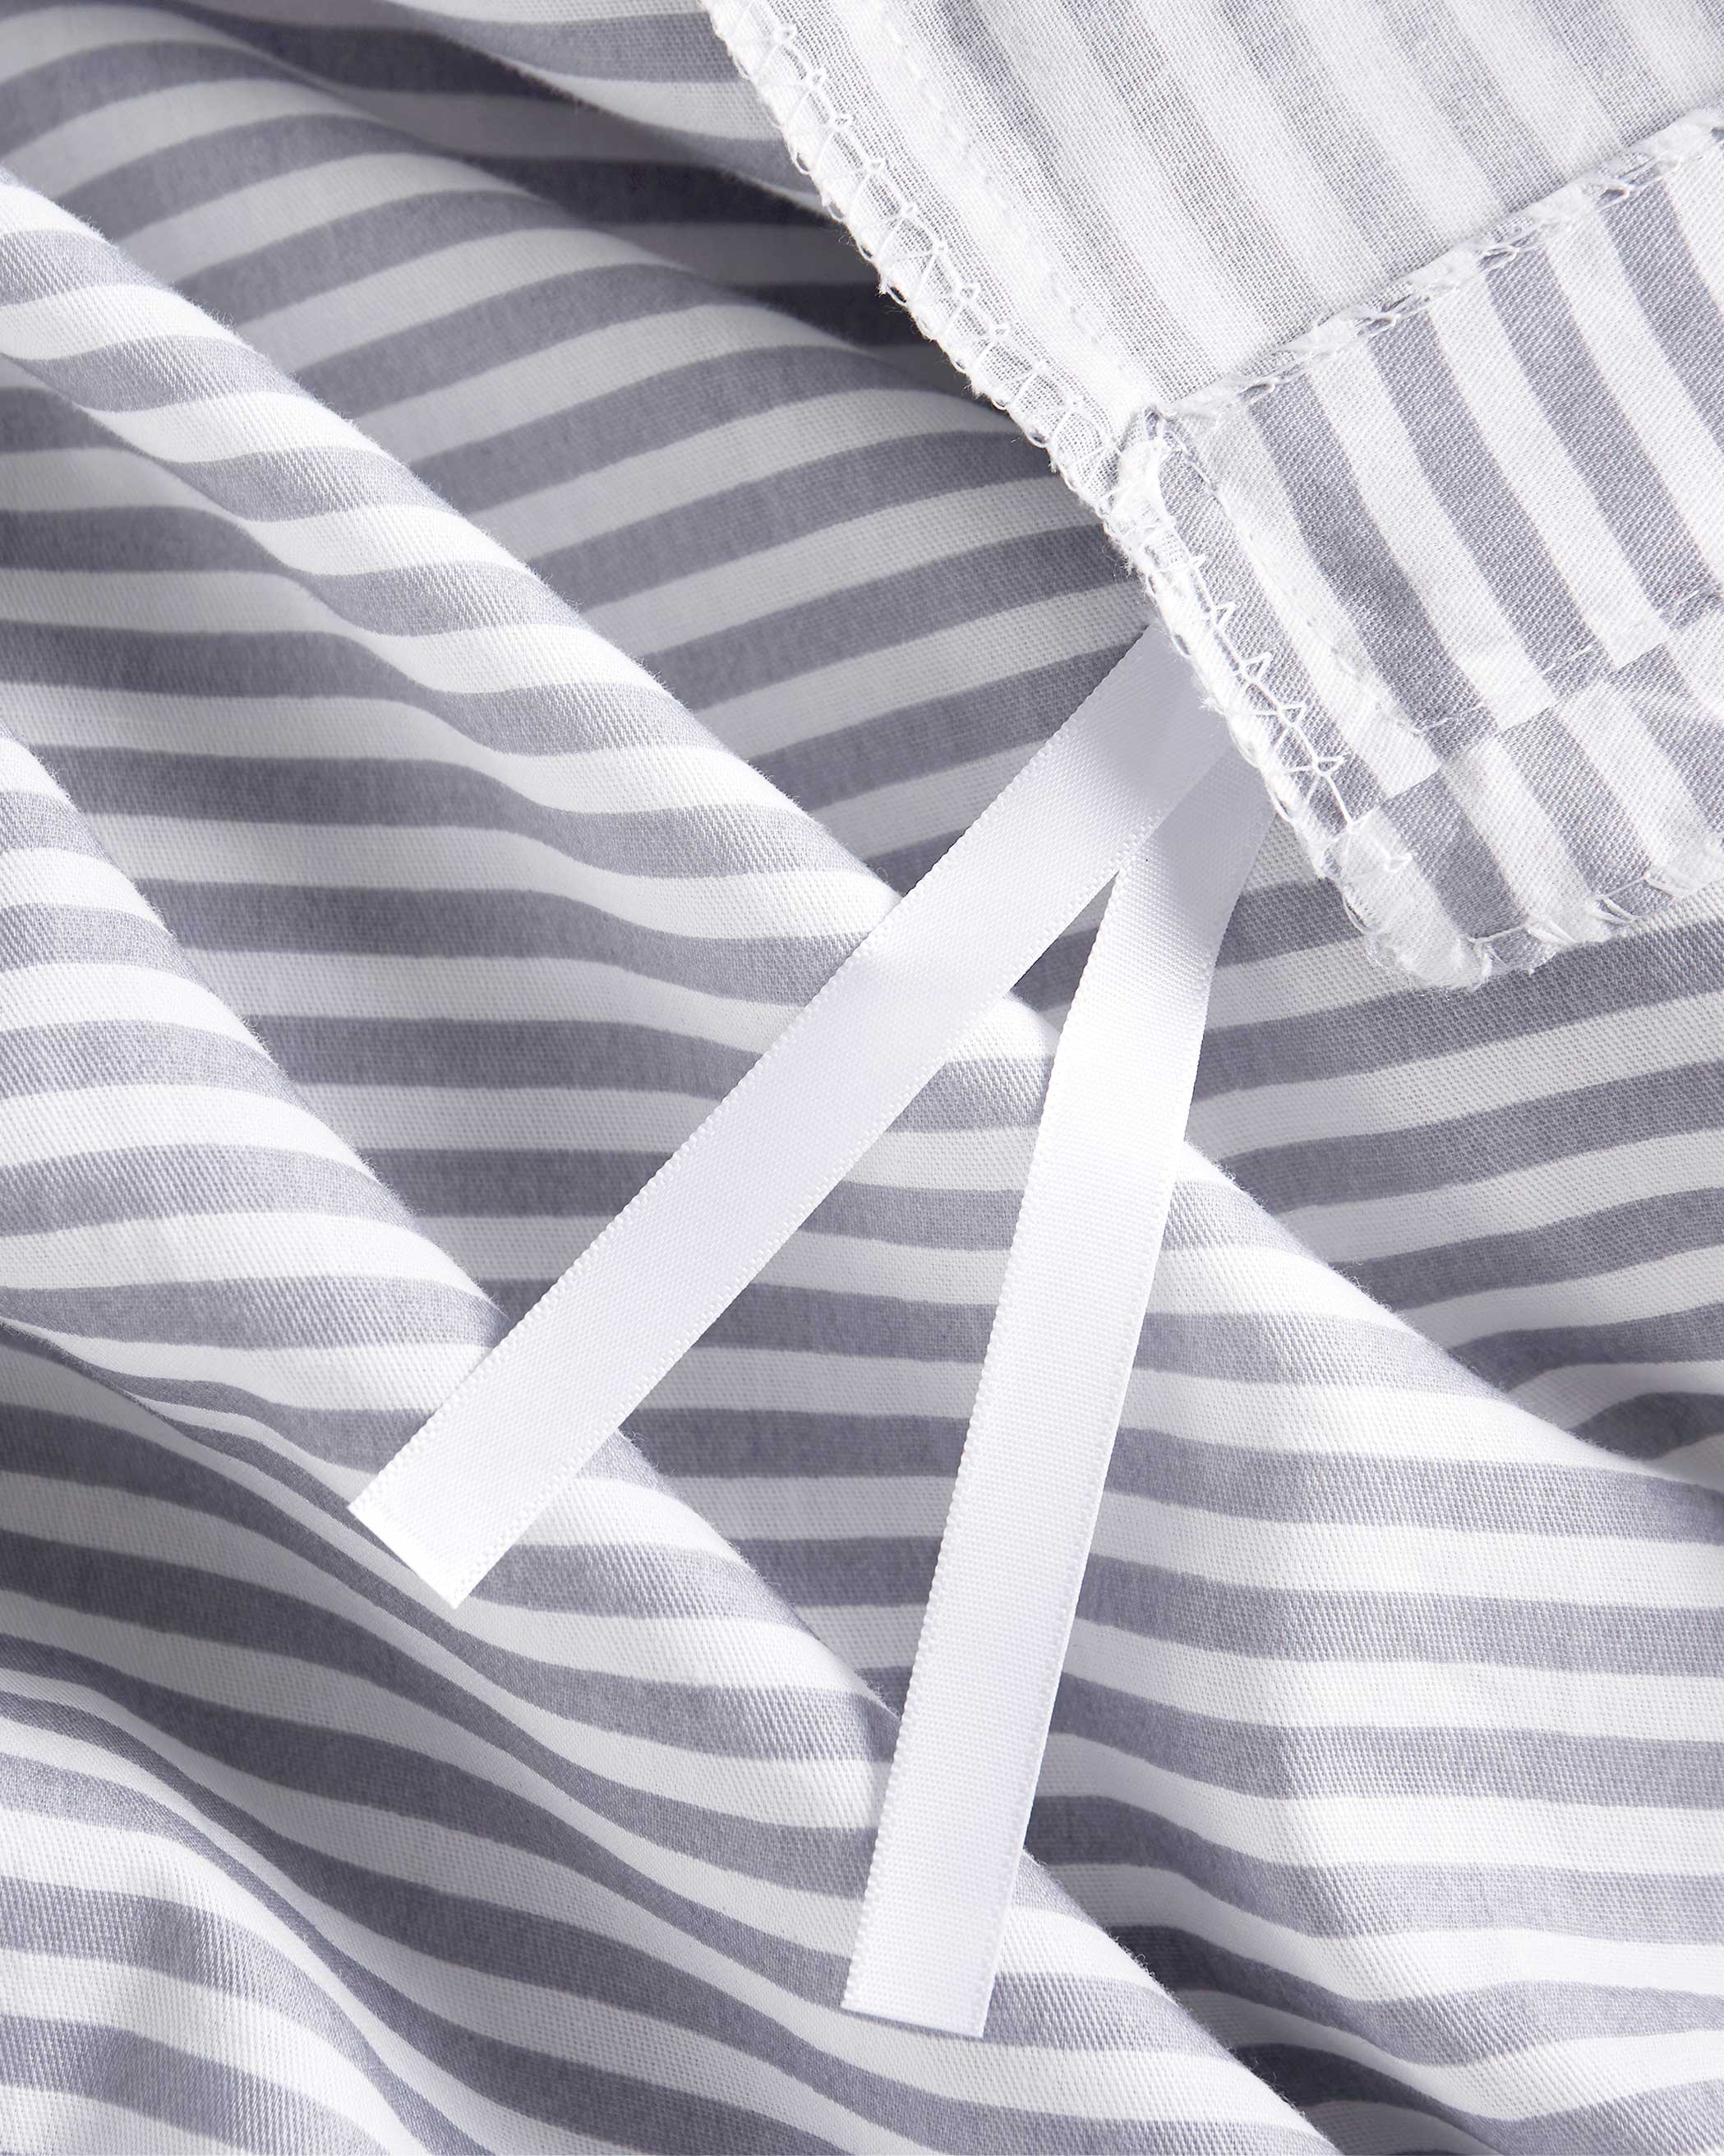 Gray Striped Cotton Duvet Cover Set